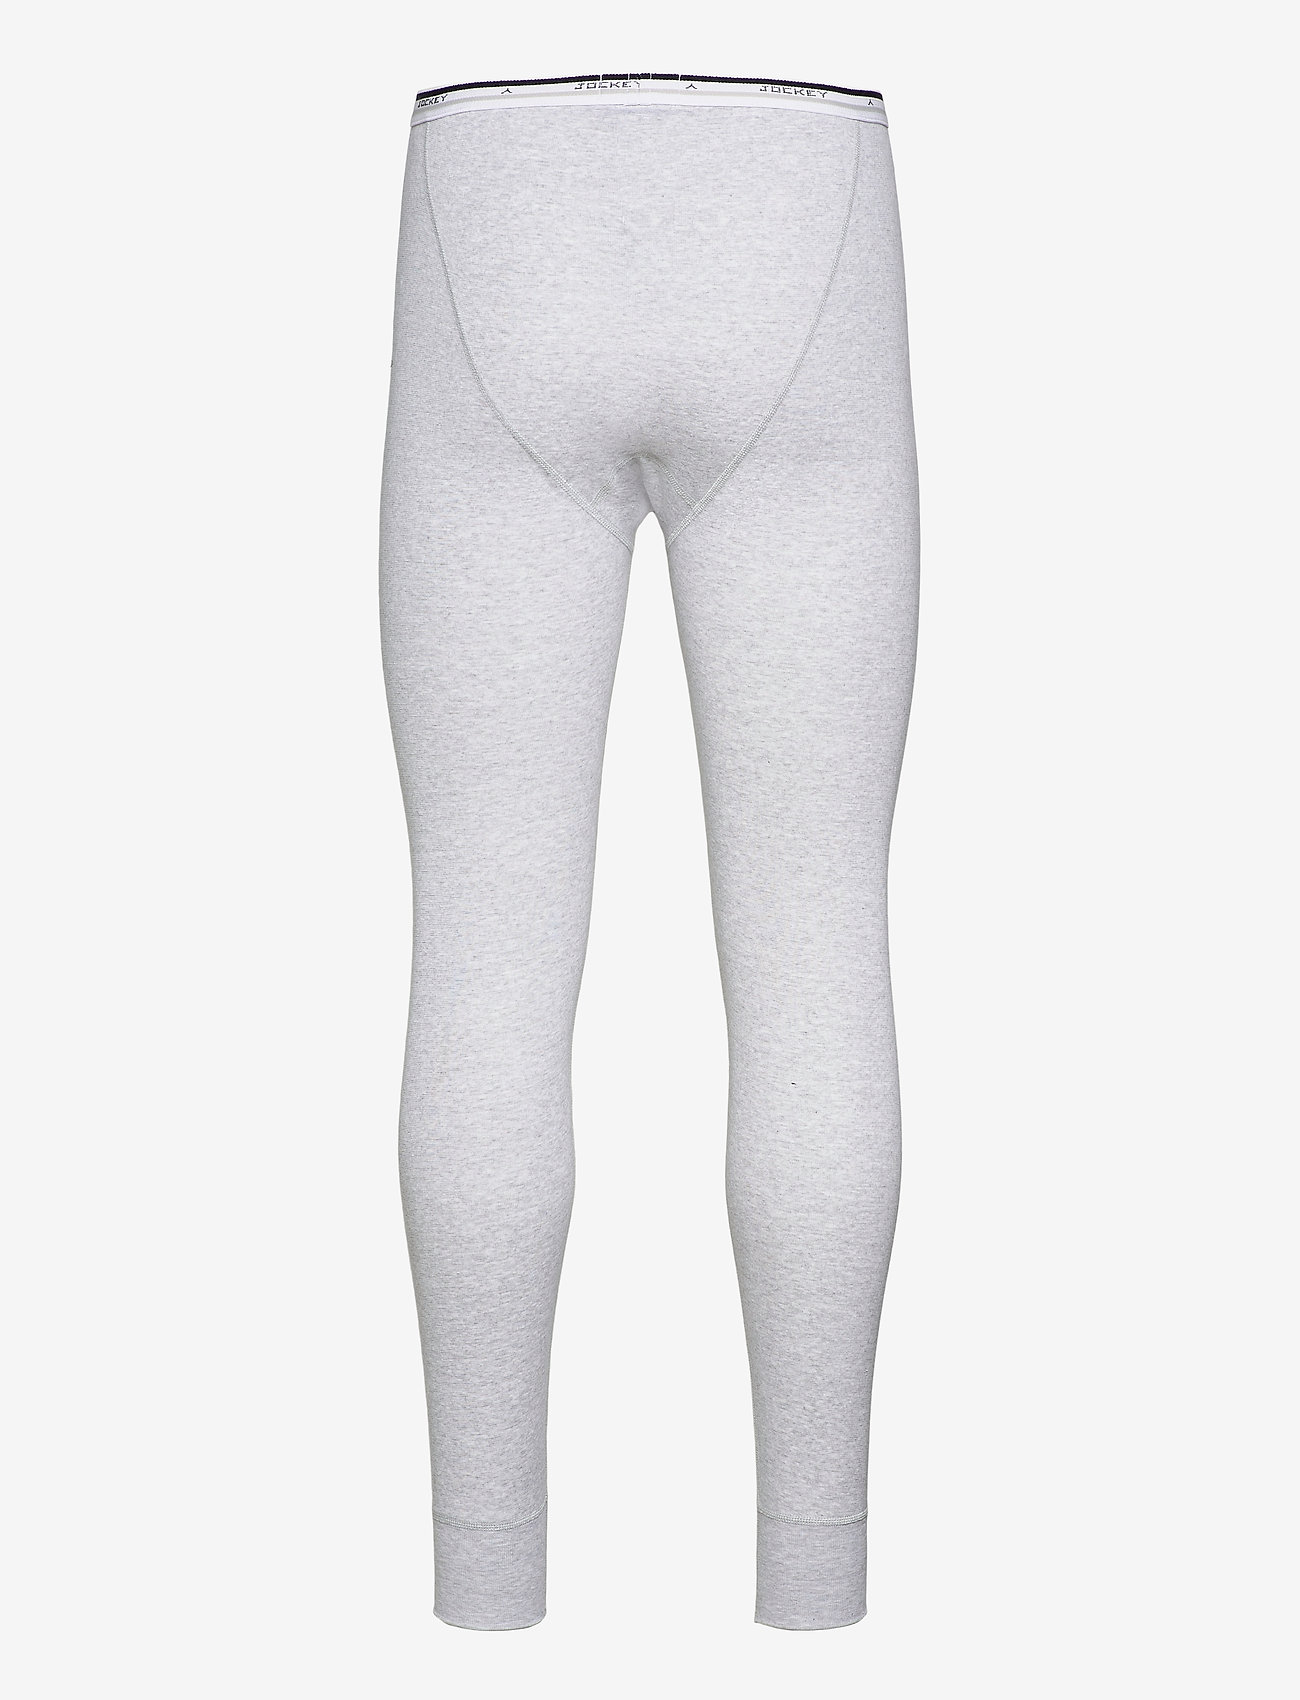 Jockey - Long spurt - base layer bottoms - grey - 1